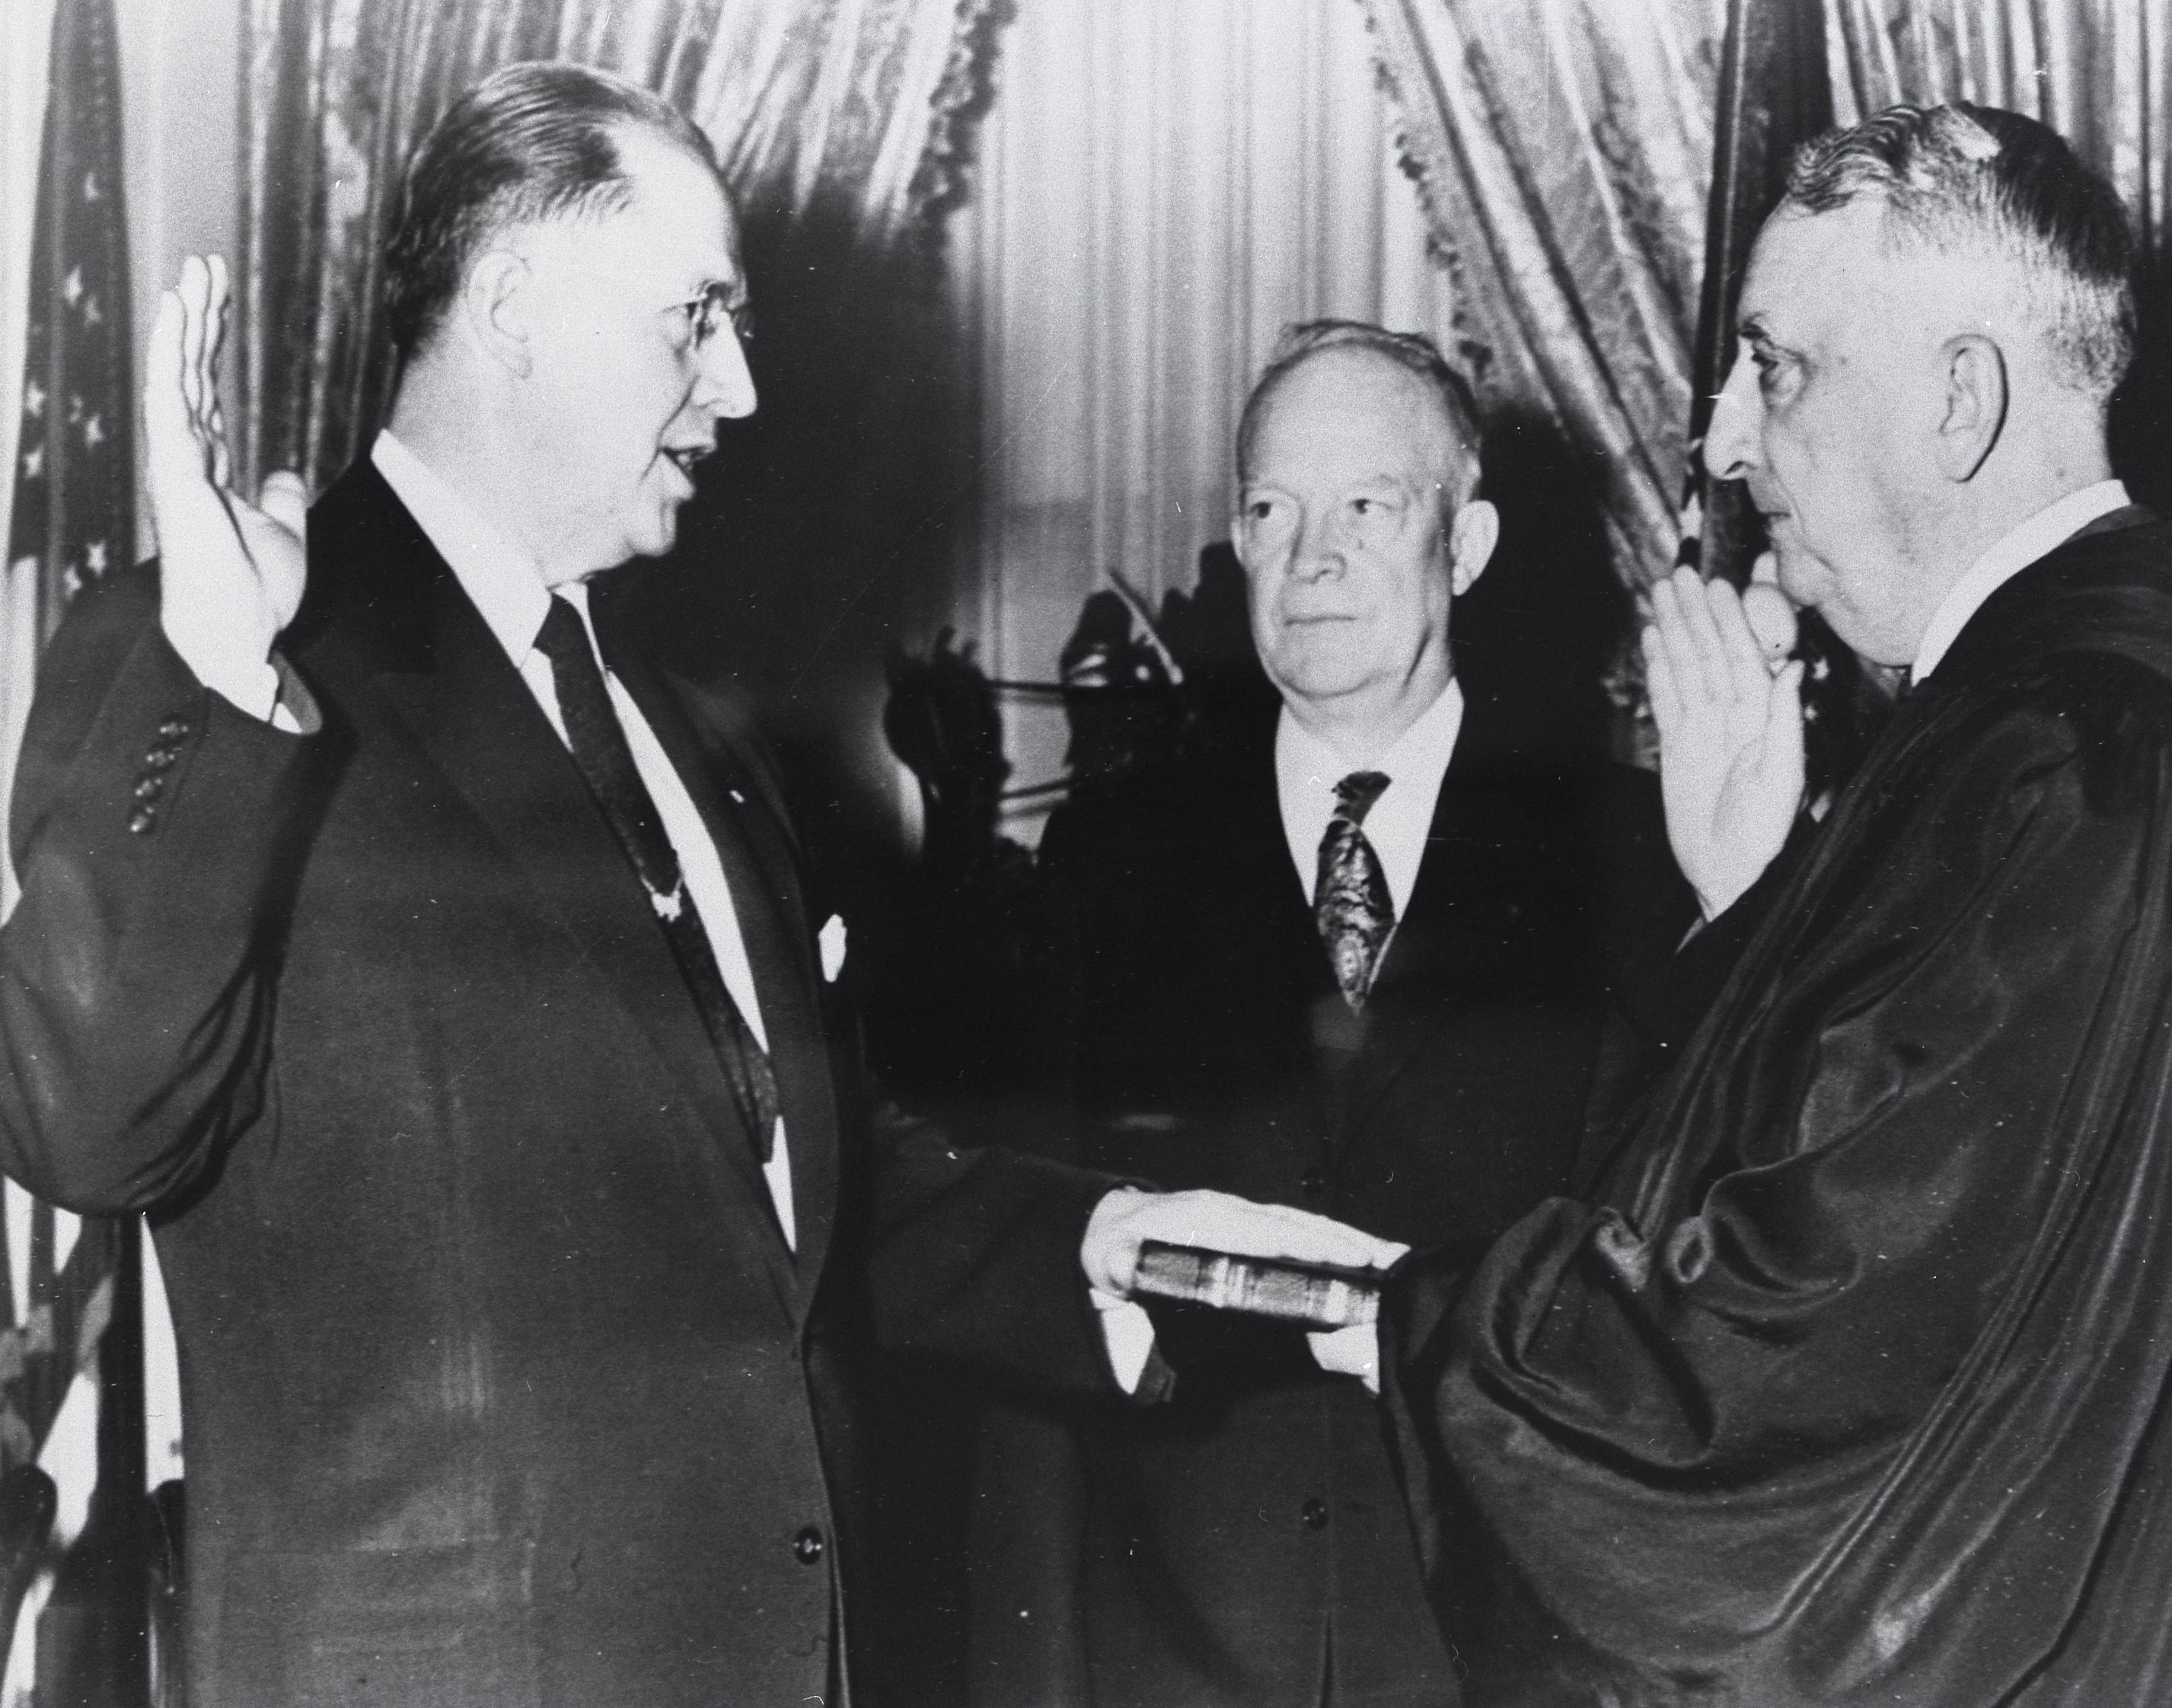 Ezra Taft Benson being sworn in as United States secretary of agriculture. Teachings of Presidents of the Church: Ezra Taft Benson (2014), 25